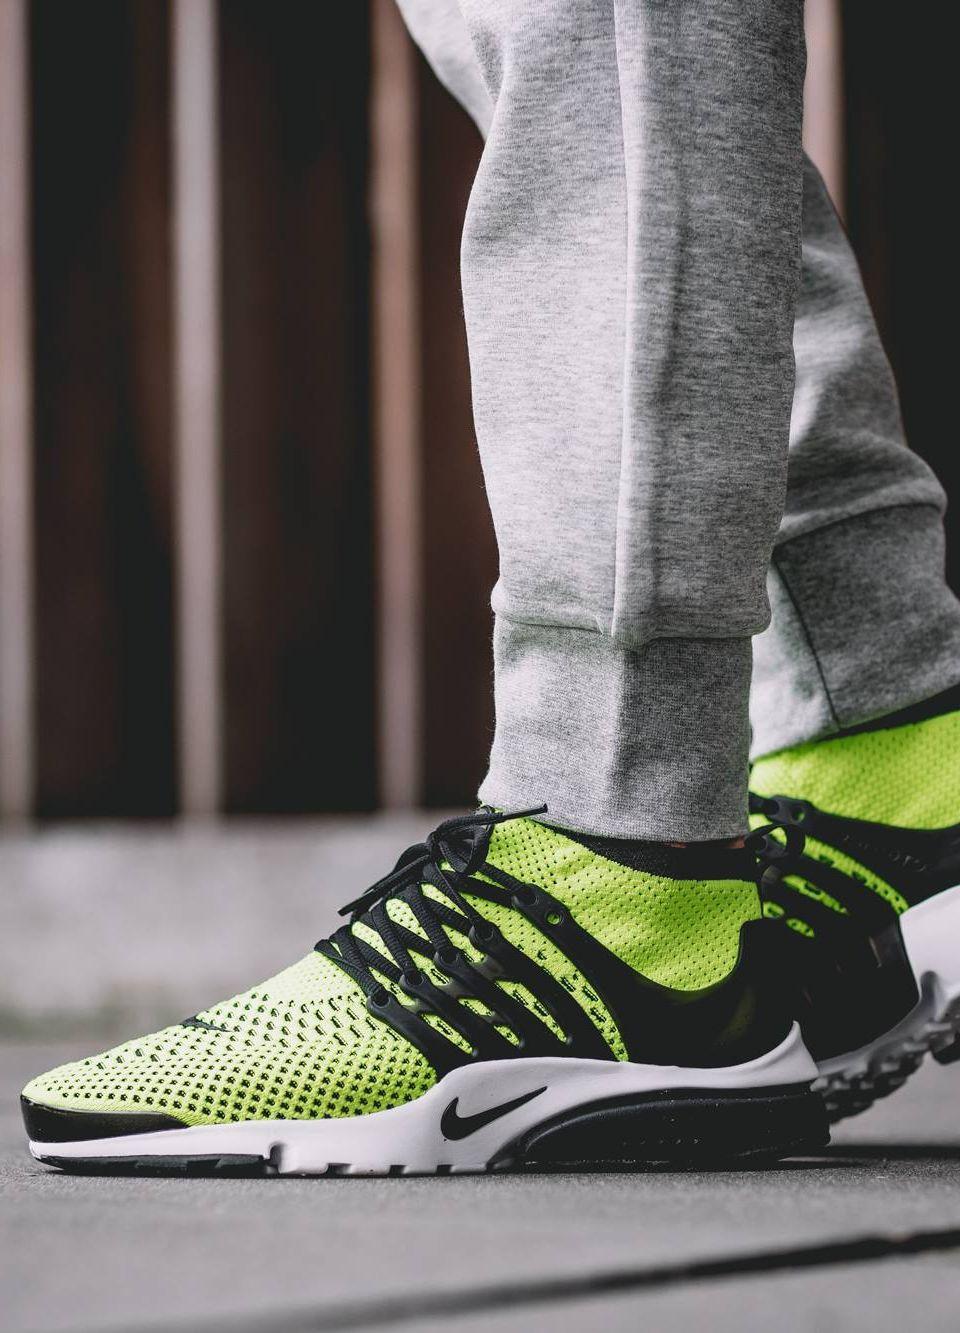 Sneakers: Nike Air Presto Flyknit Ultra 'Volt/Black' .